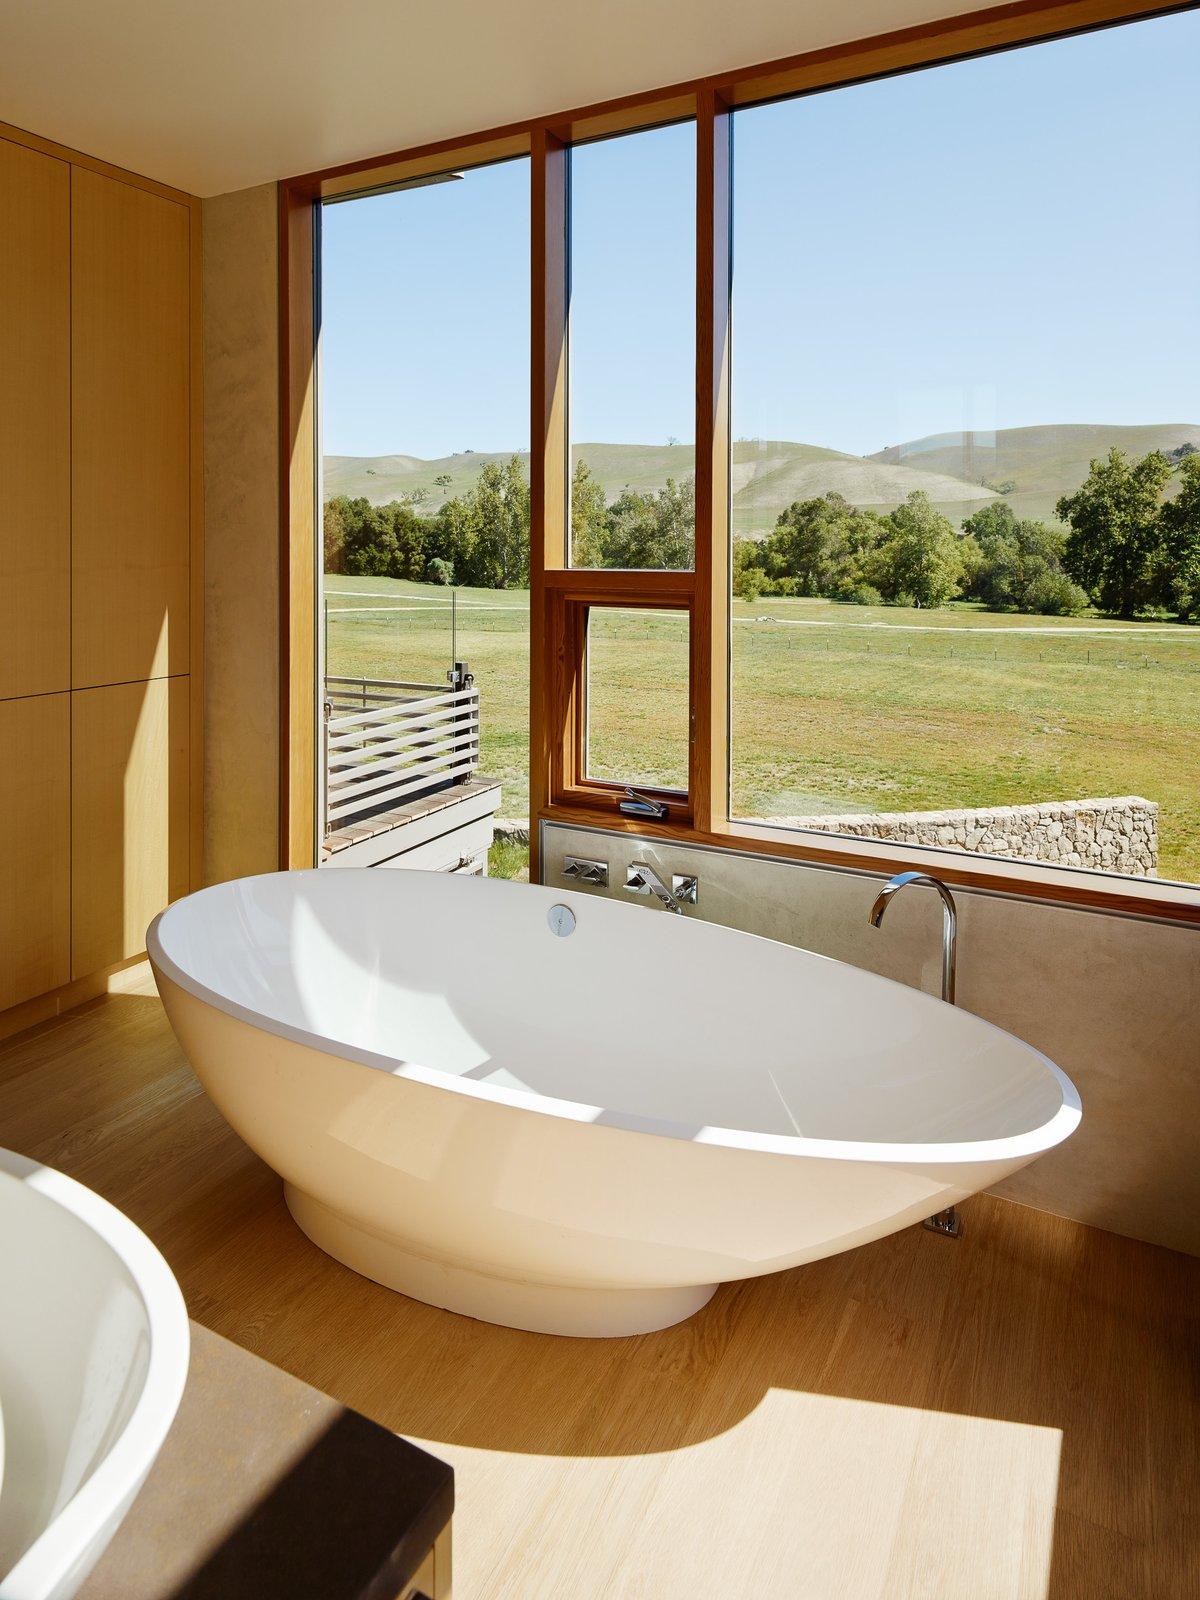 Tagged: Bath Room, Light Hardwood Floor, Freestanding Tub, and Vessel Sink.  Spring Ranch by Feldman Architecture